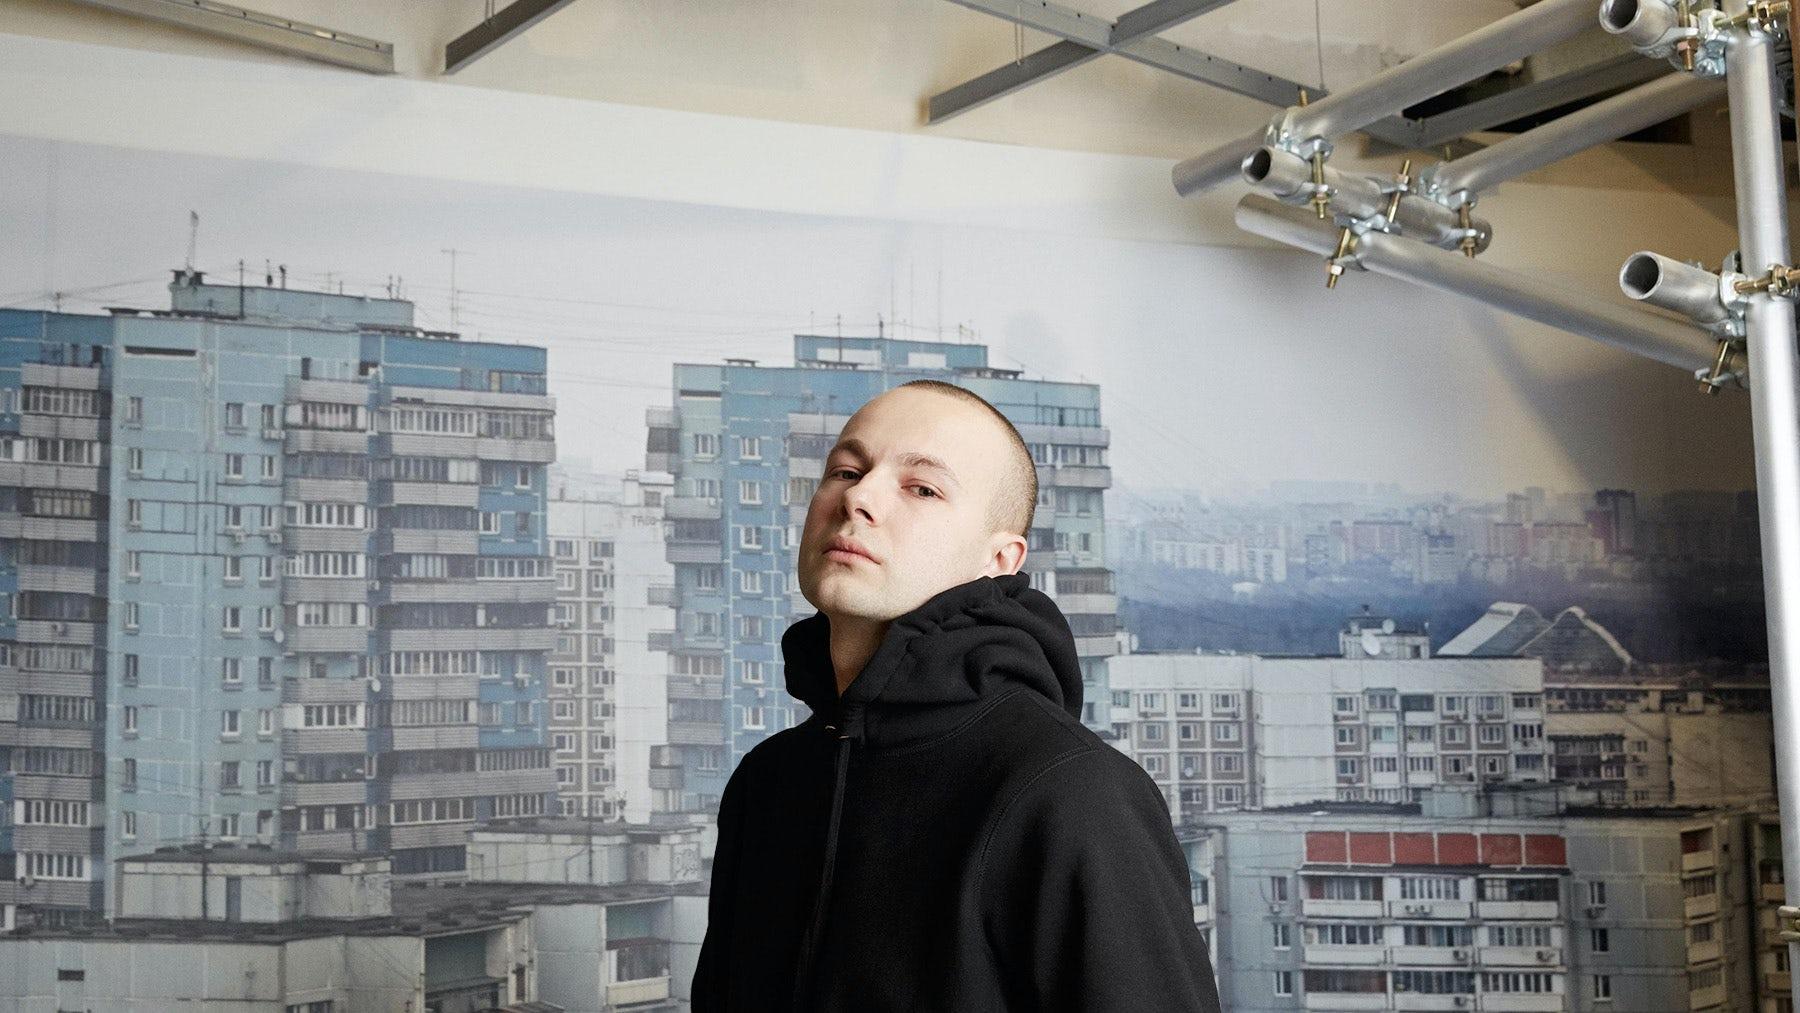 Designer Gosha Rubchinskiy in the label's space at the new Dover Street Market in London | Photo: Thomas Lohr for BoF